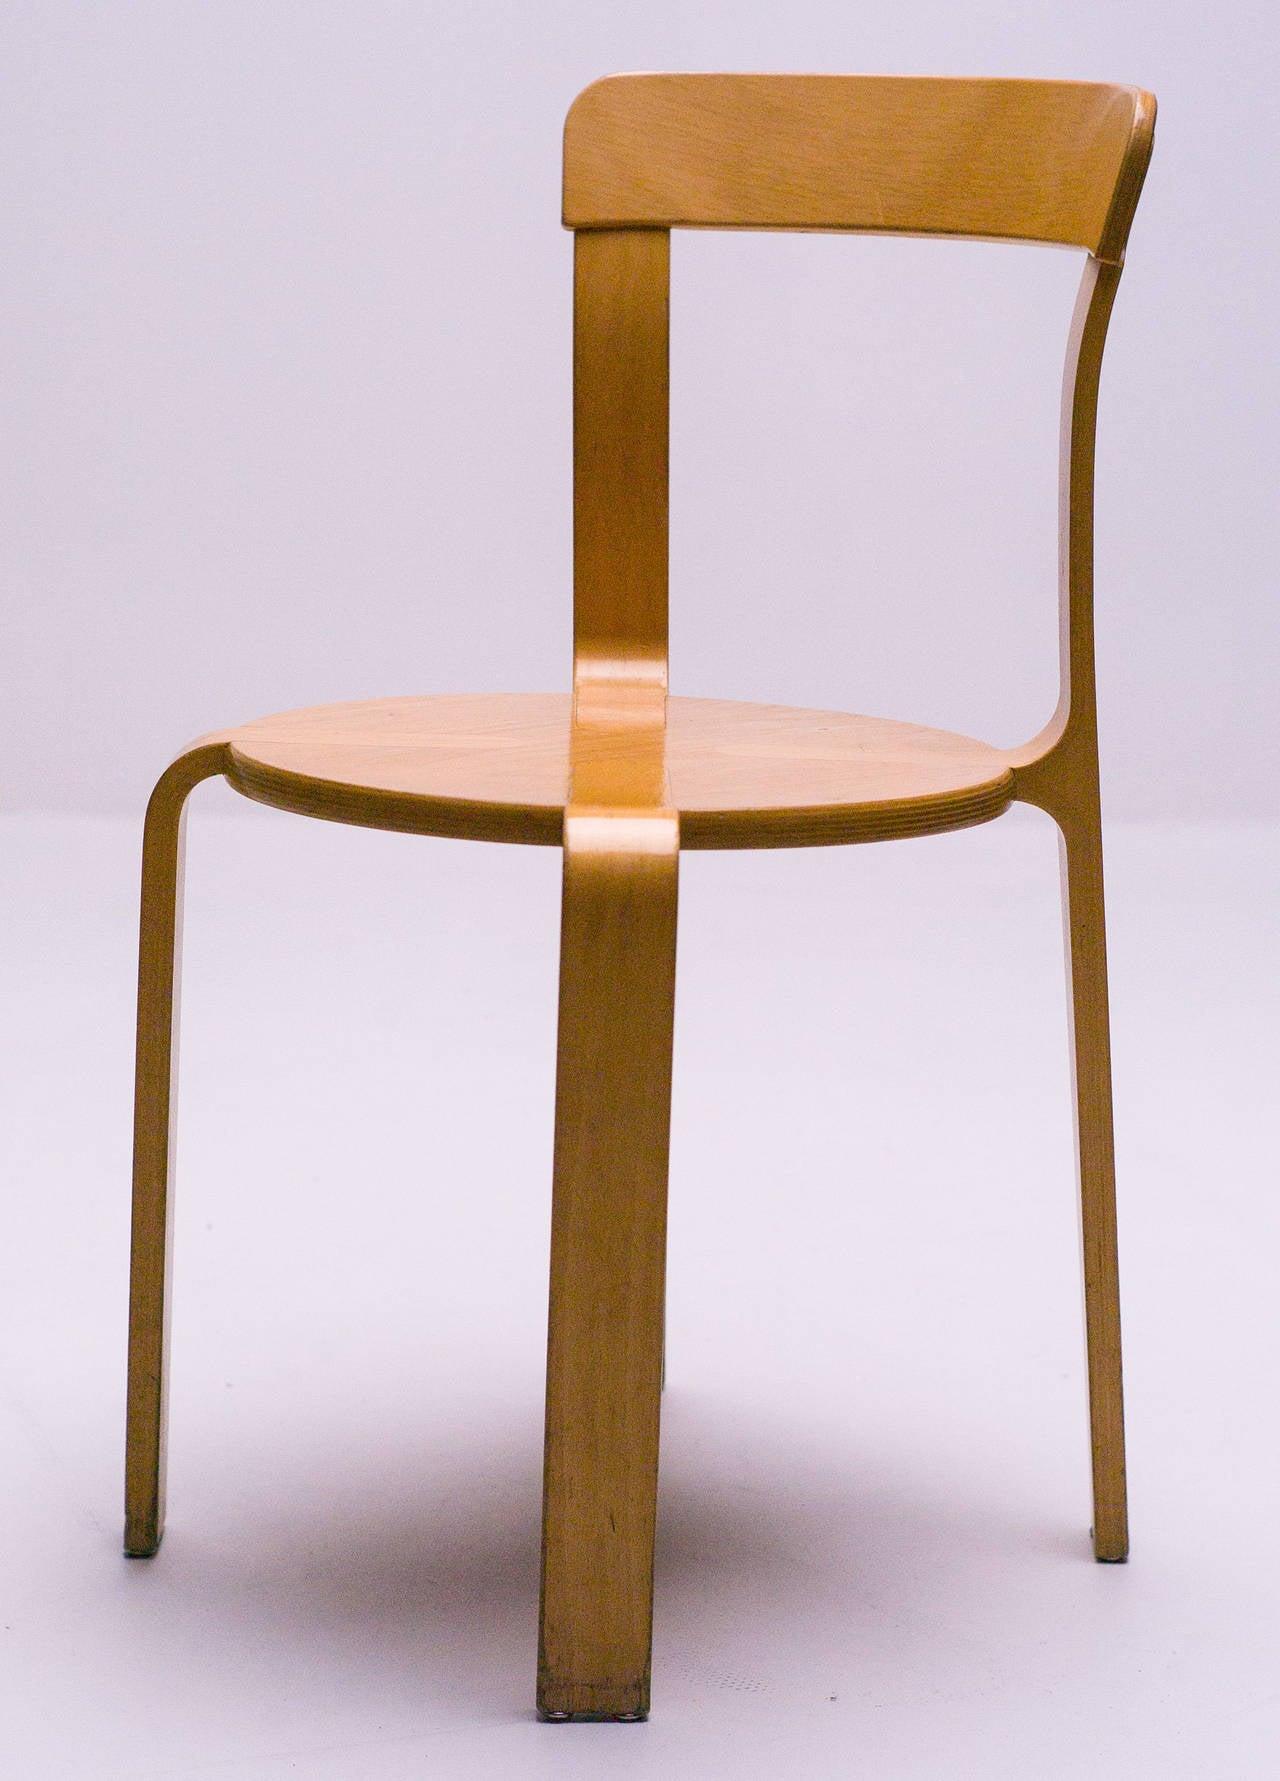 Rey Chair by Bruno Rey Swiss 1971 at 1stdibs